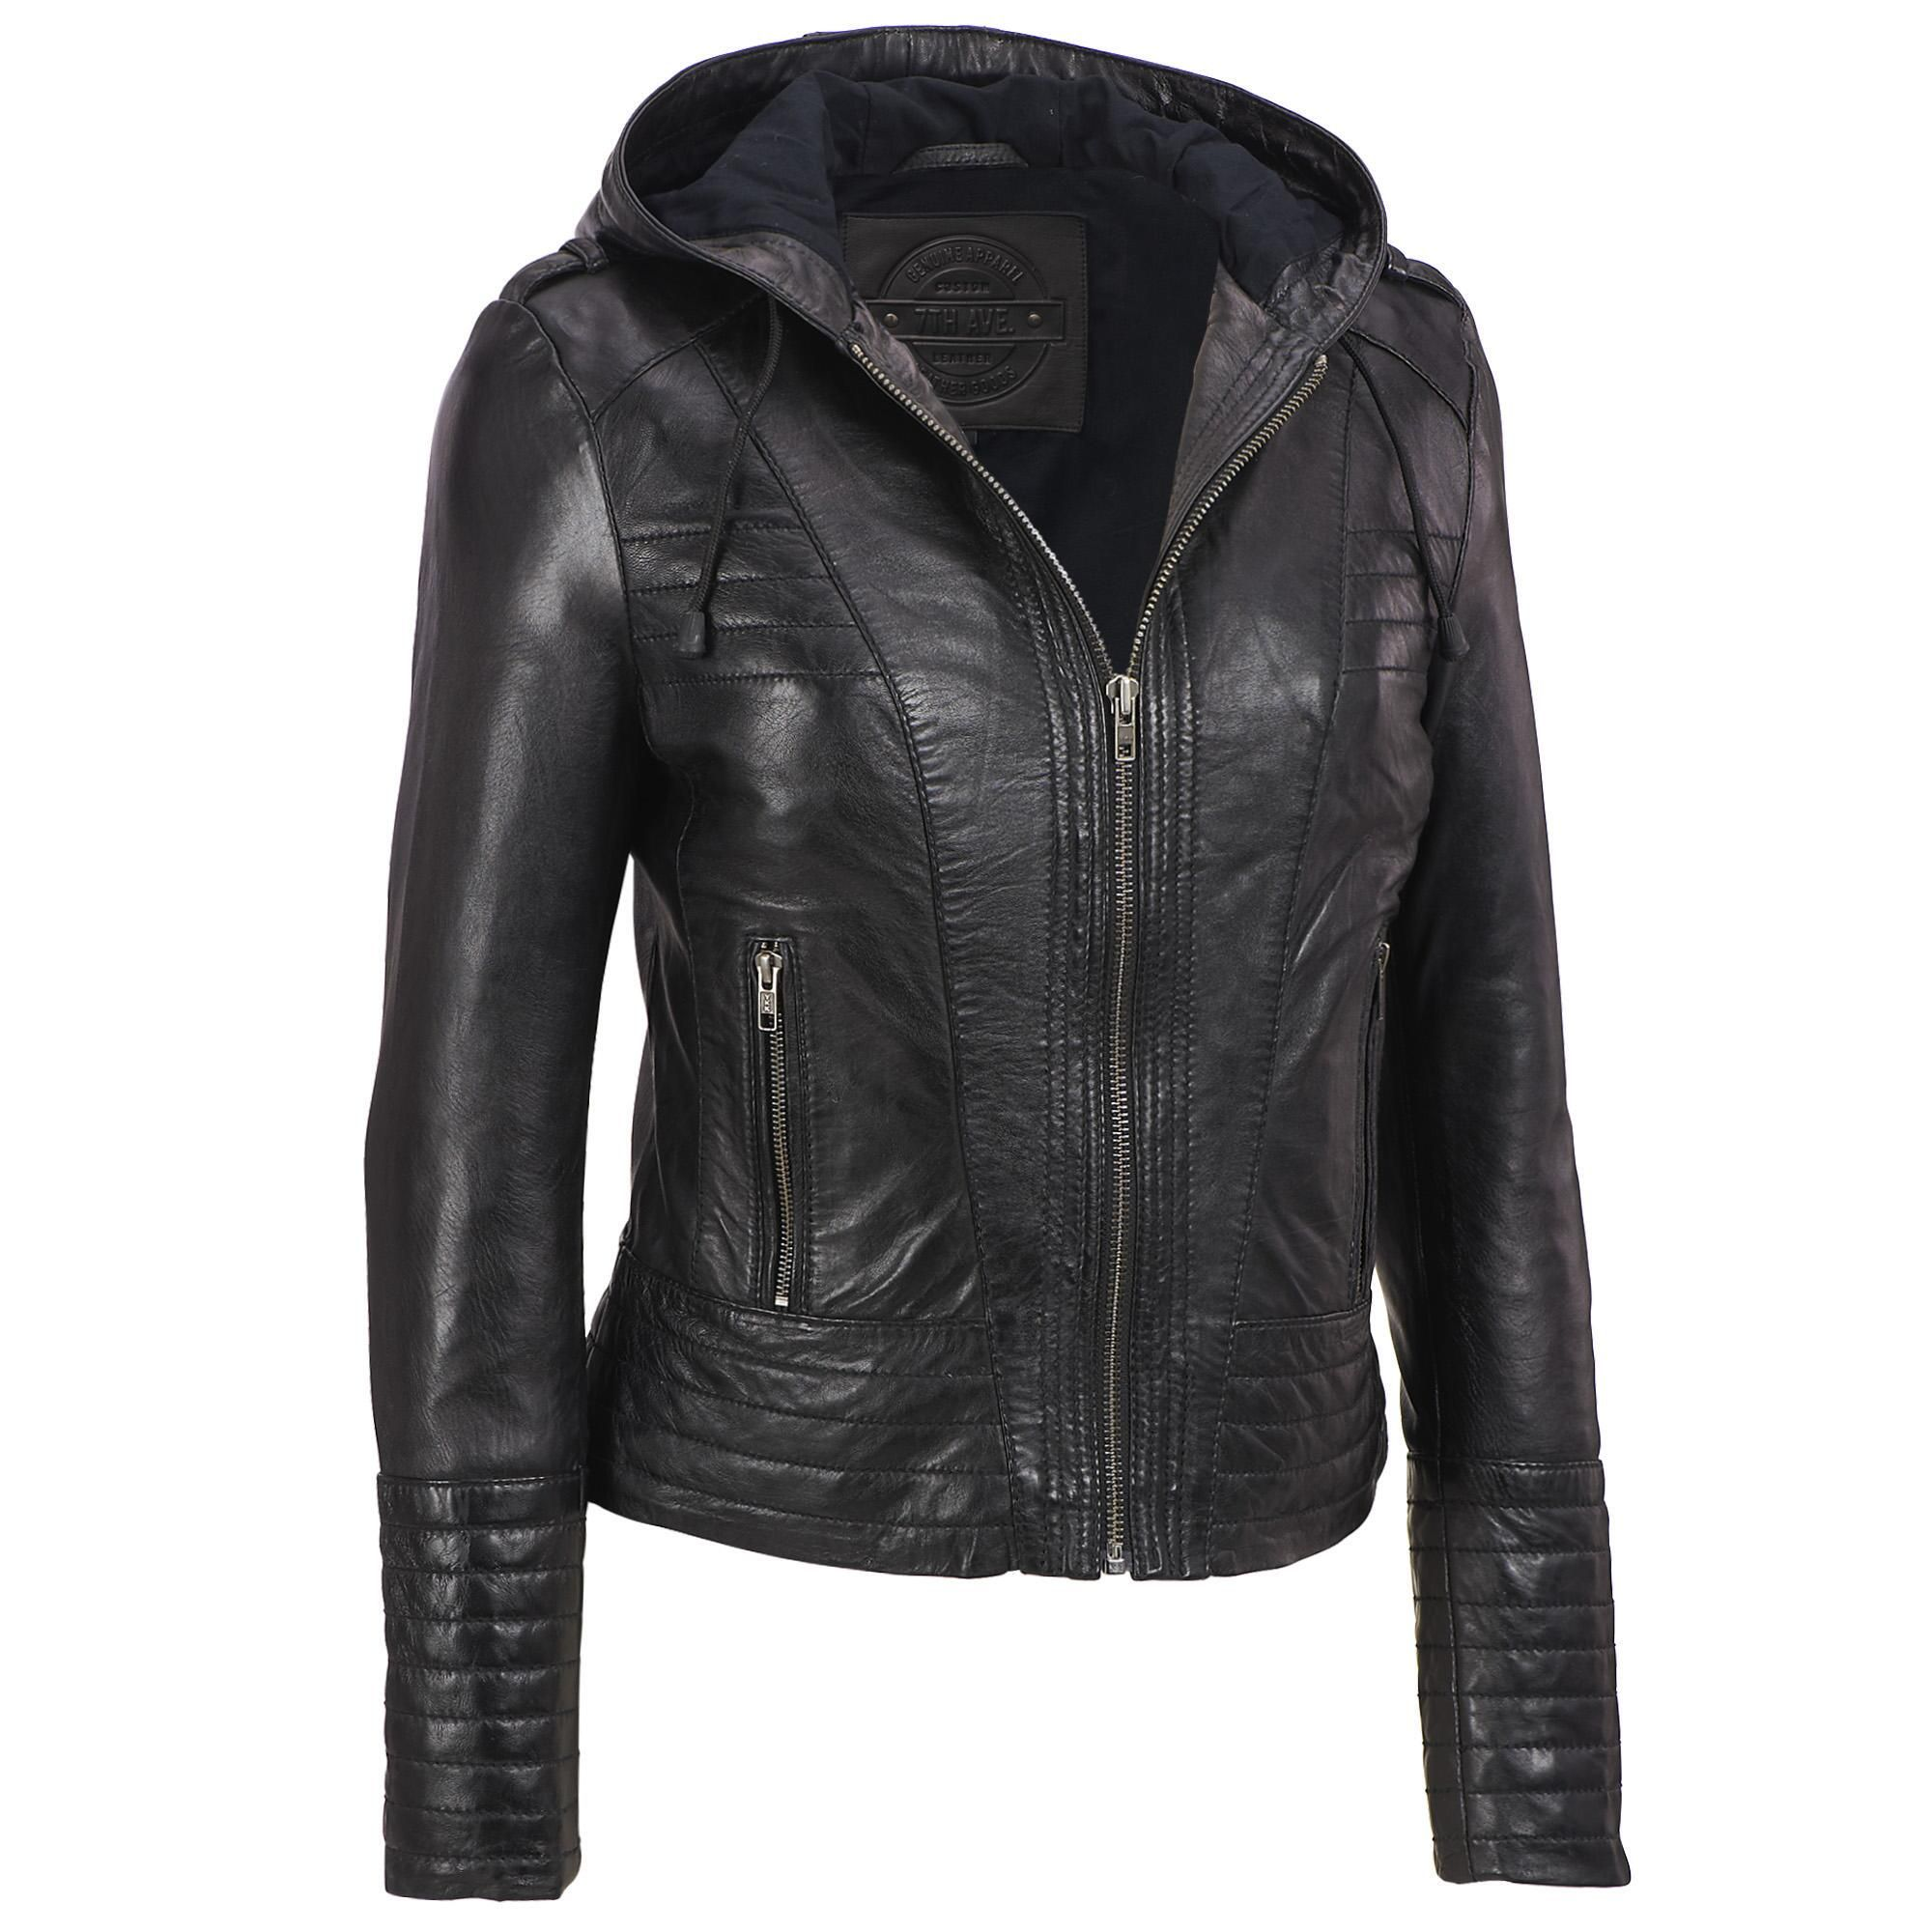 Milwaukee Leather 7th Avenue Lamb Cycle Jacket w/Hood Was